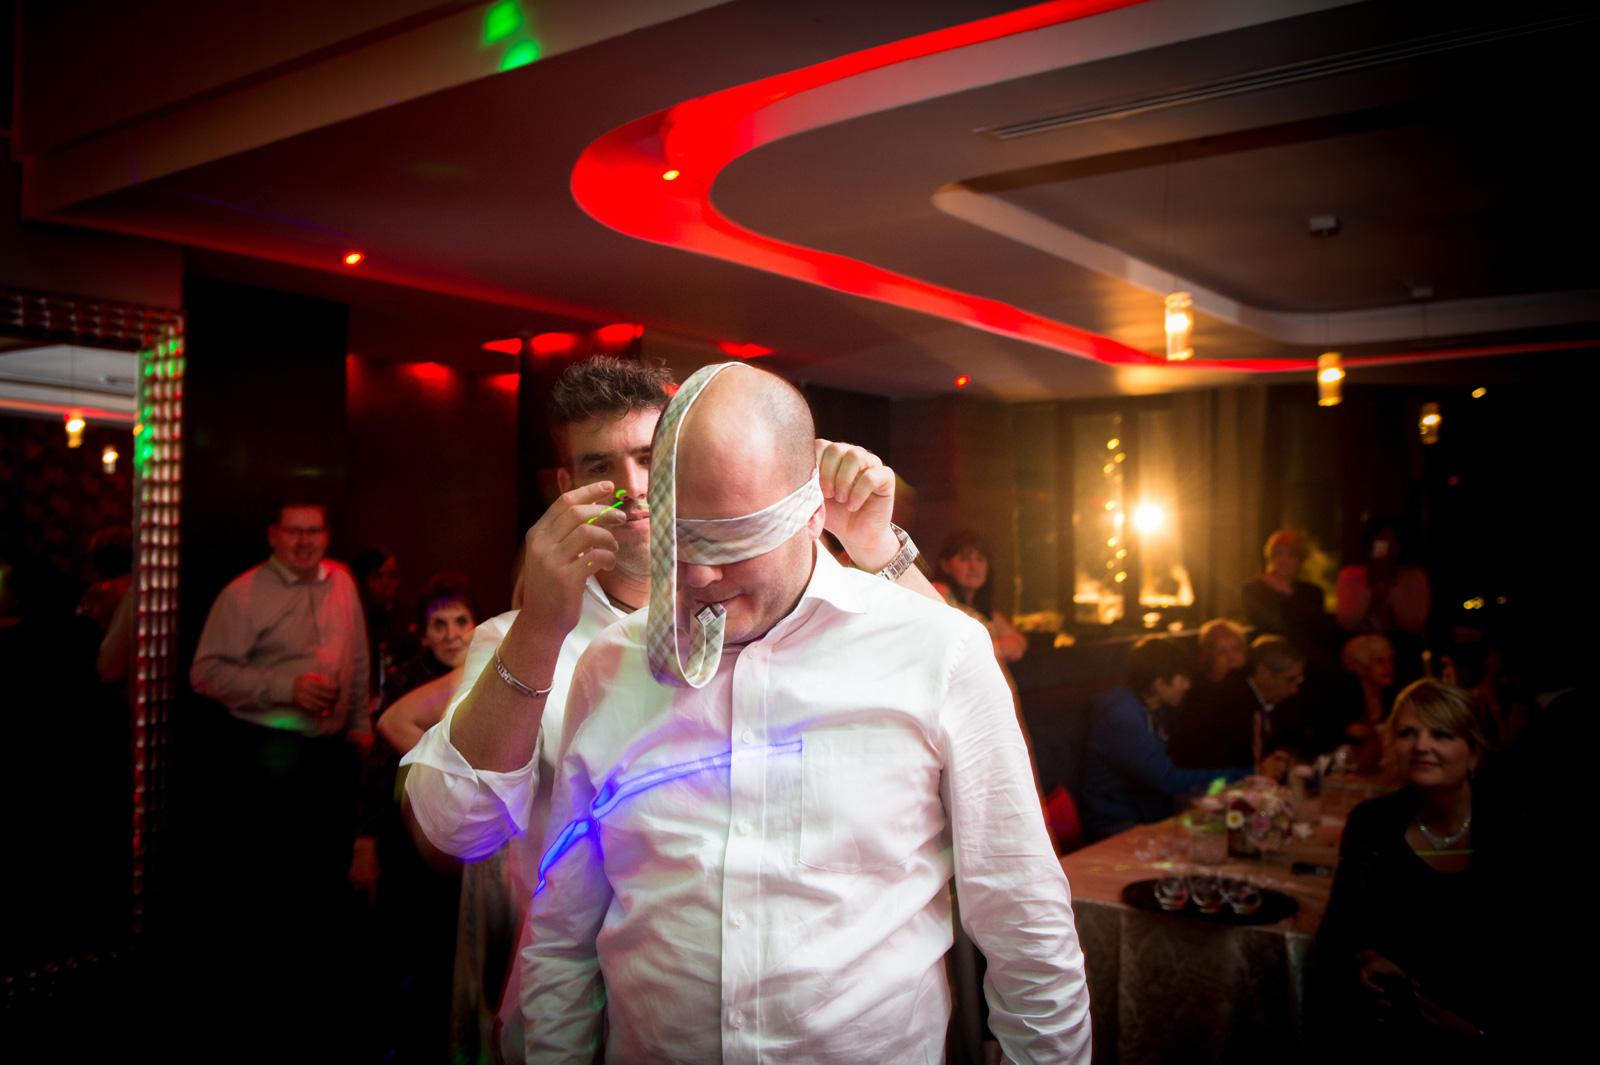 blindfolded groom with garter